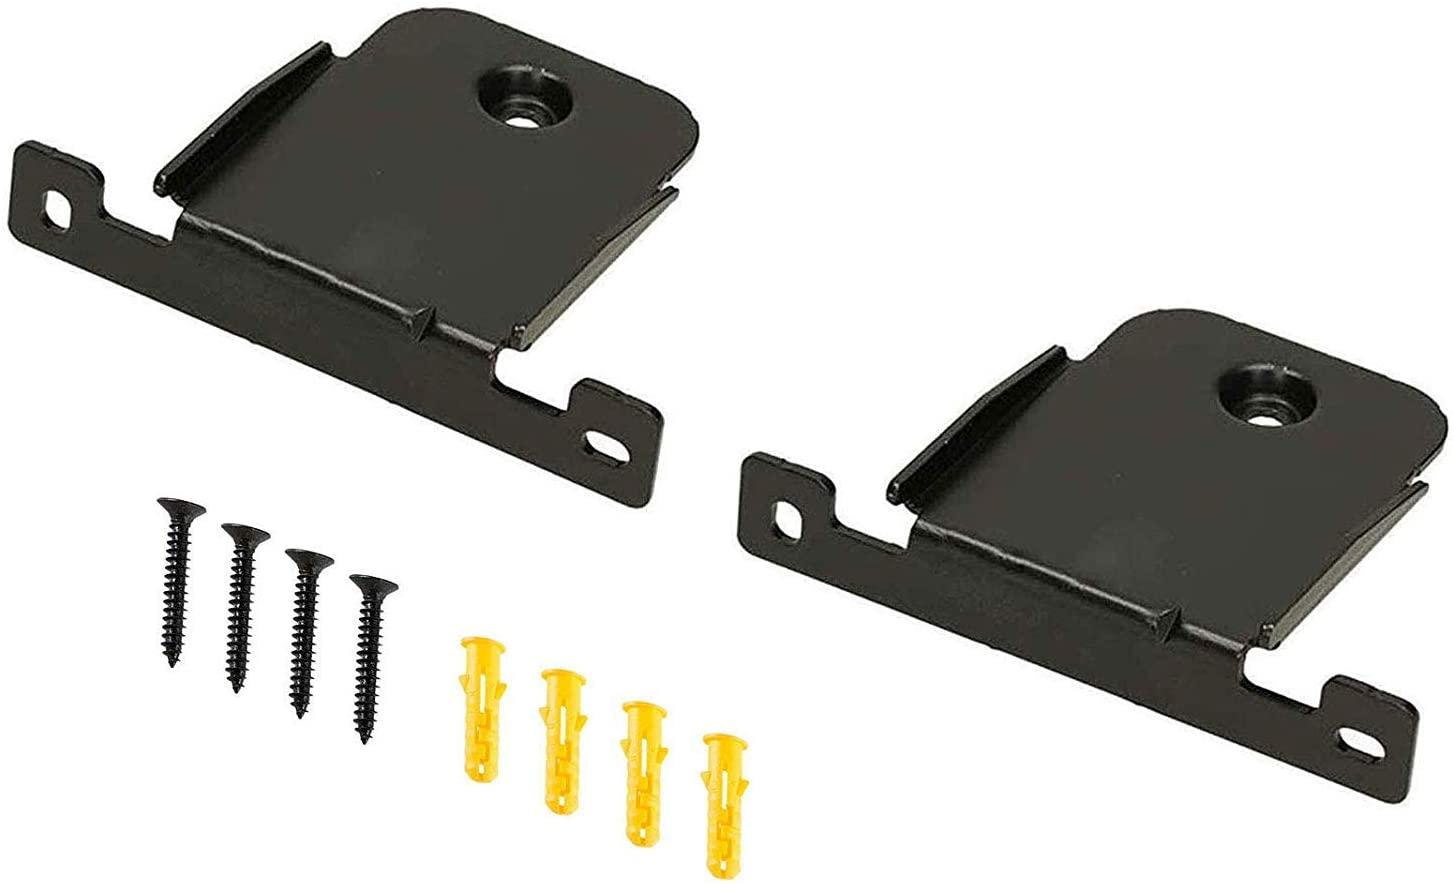 Wall Mount Bracket for LG SH2 Soundbar Speaker Stands, 2 Pieces Black Wall Bracket Holder with Screws